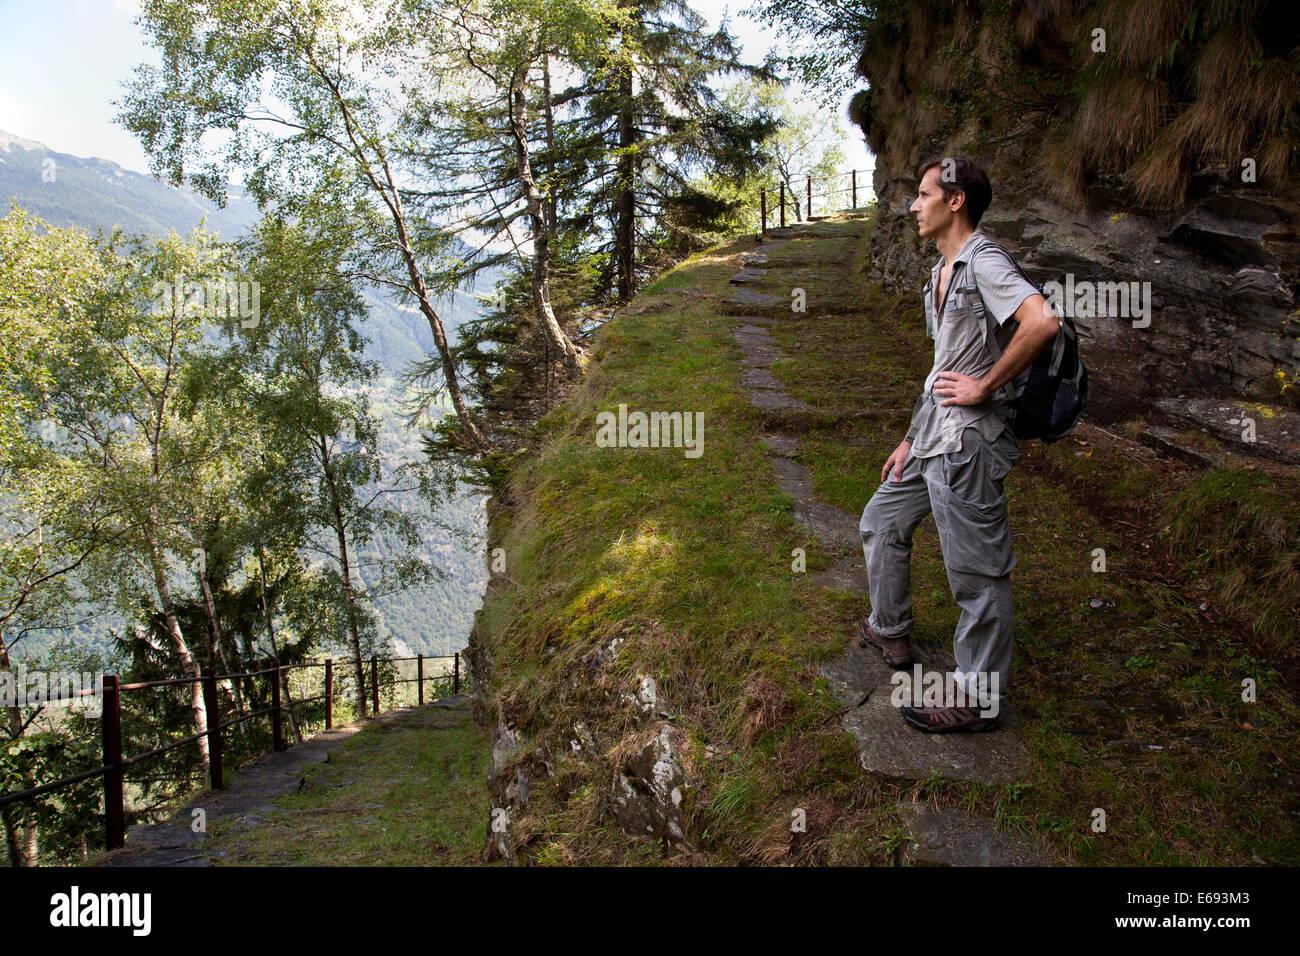 Man on mountain path pausing to admire the views. - Stock Image